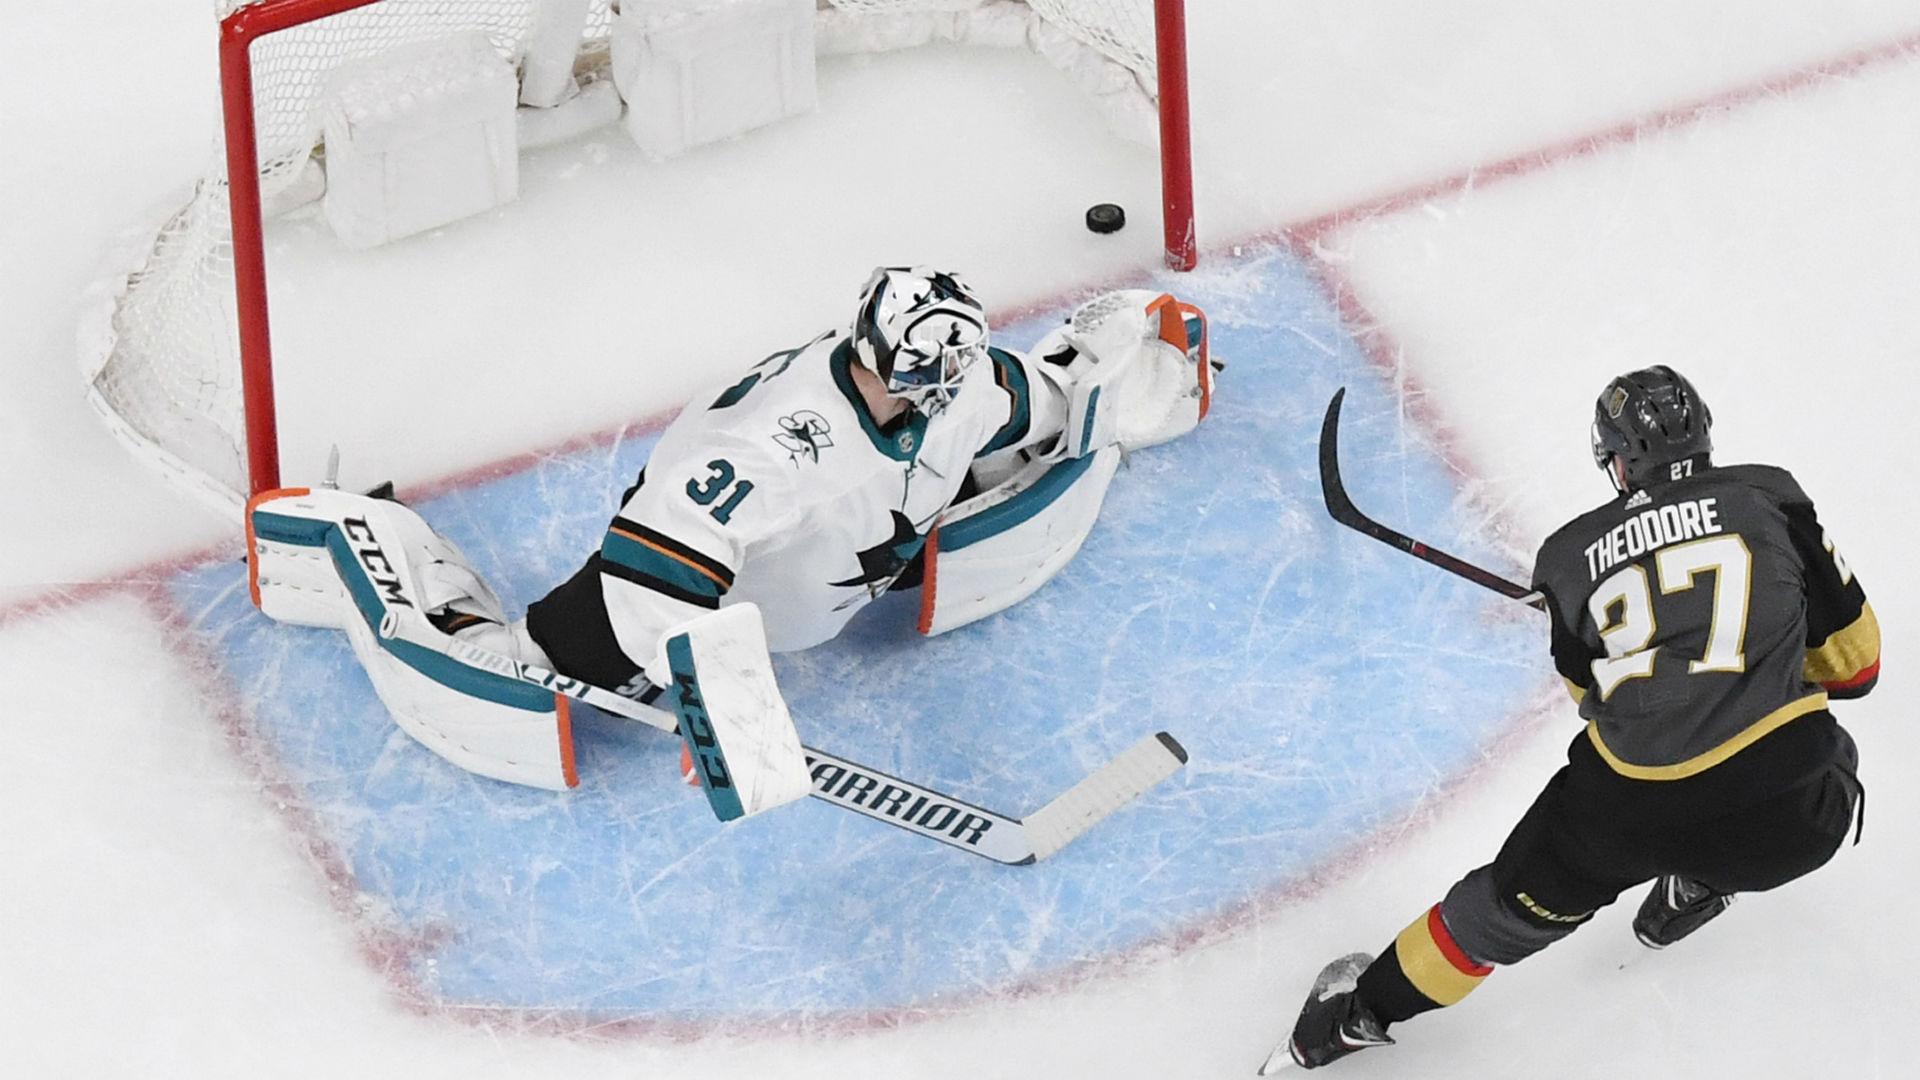 NHL playoffs 2019: Sharks' Martin Jones, pulled in Game 4, named starter for Game 5